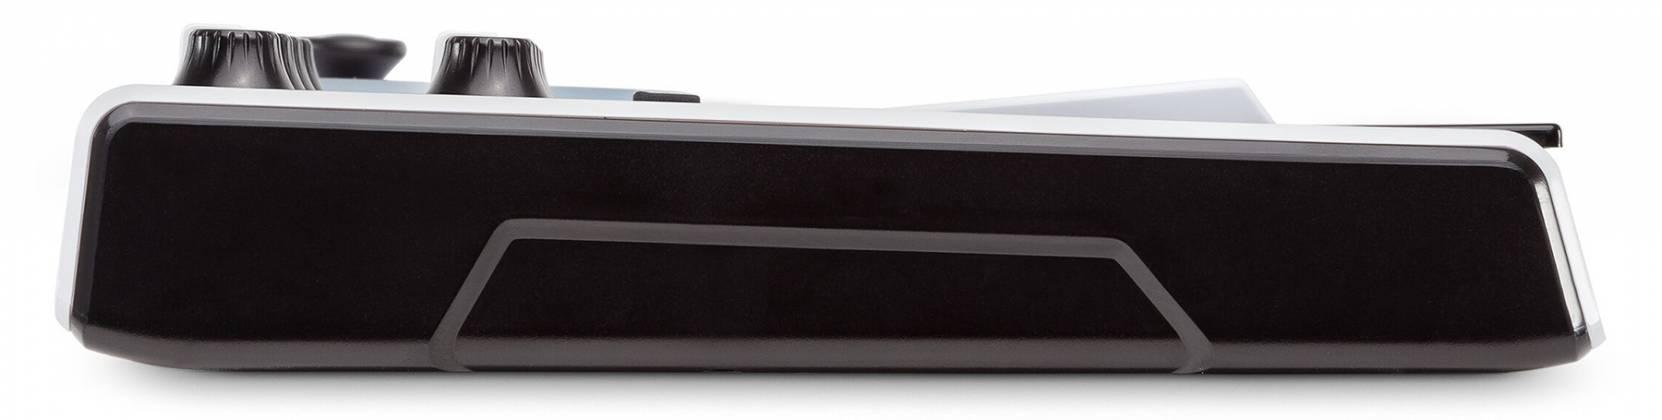 Akai MPKMINI2WHITE Limited Edition 25 Key Portable USB MIDI Keyboard Product Image 6